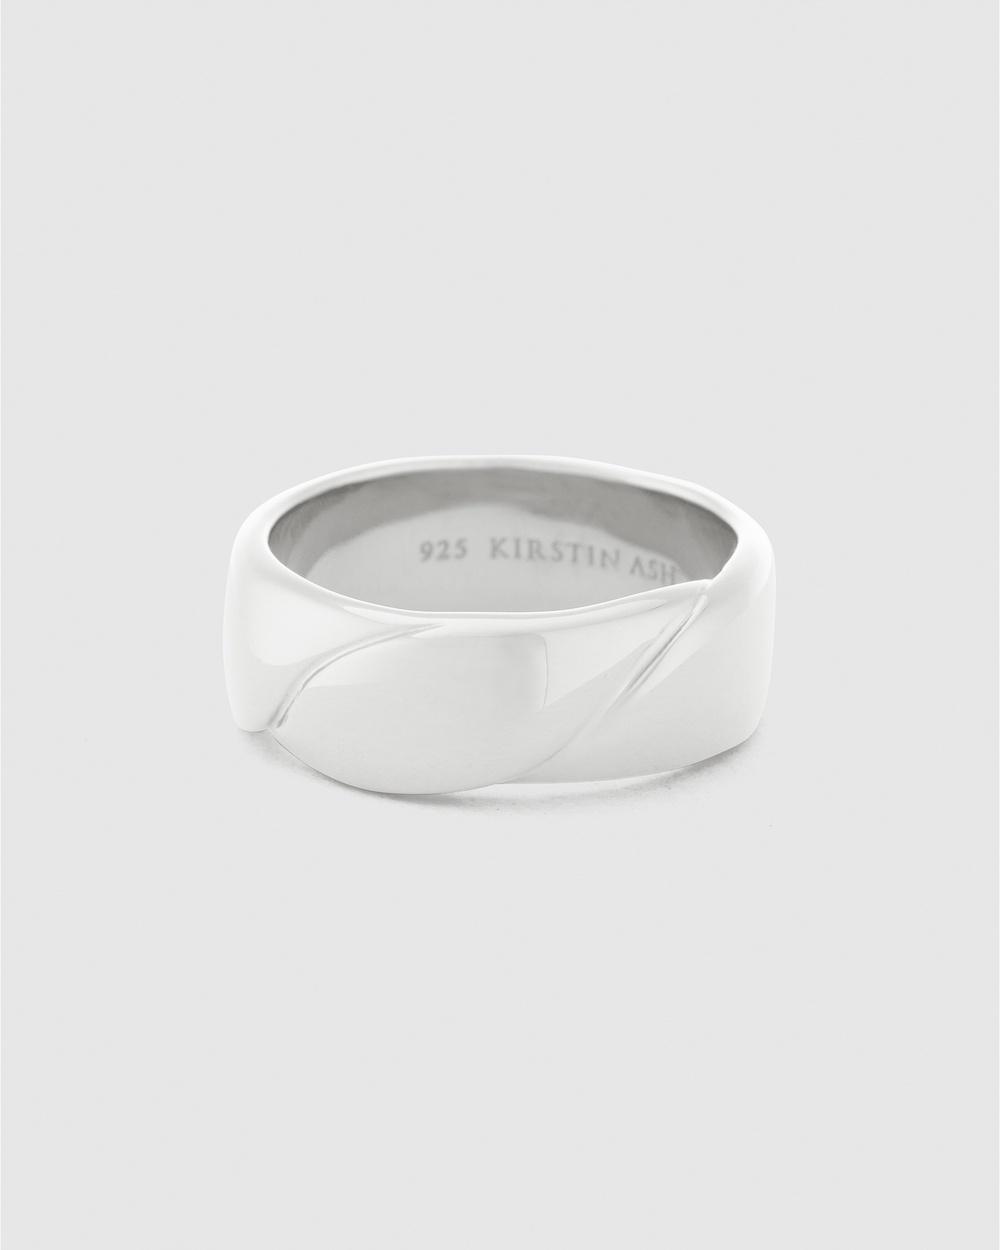 Kirstin Ash Embrace Ring Jewellery Silver